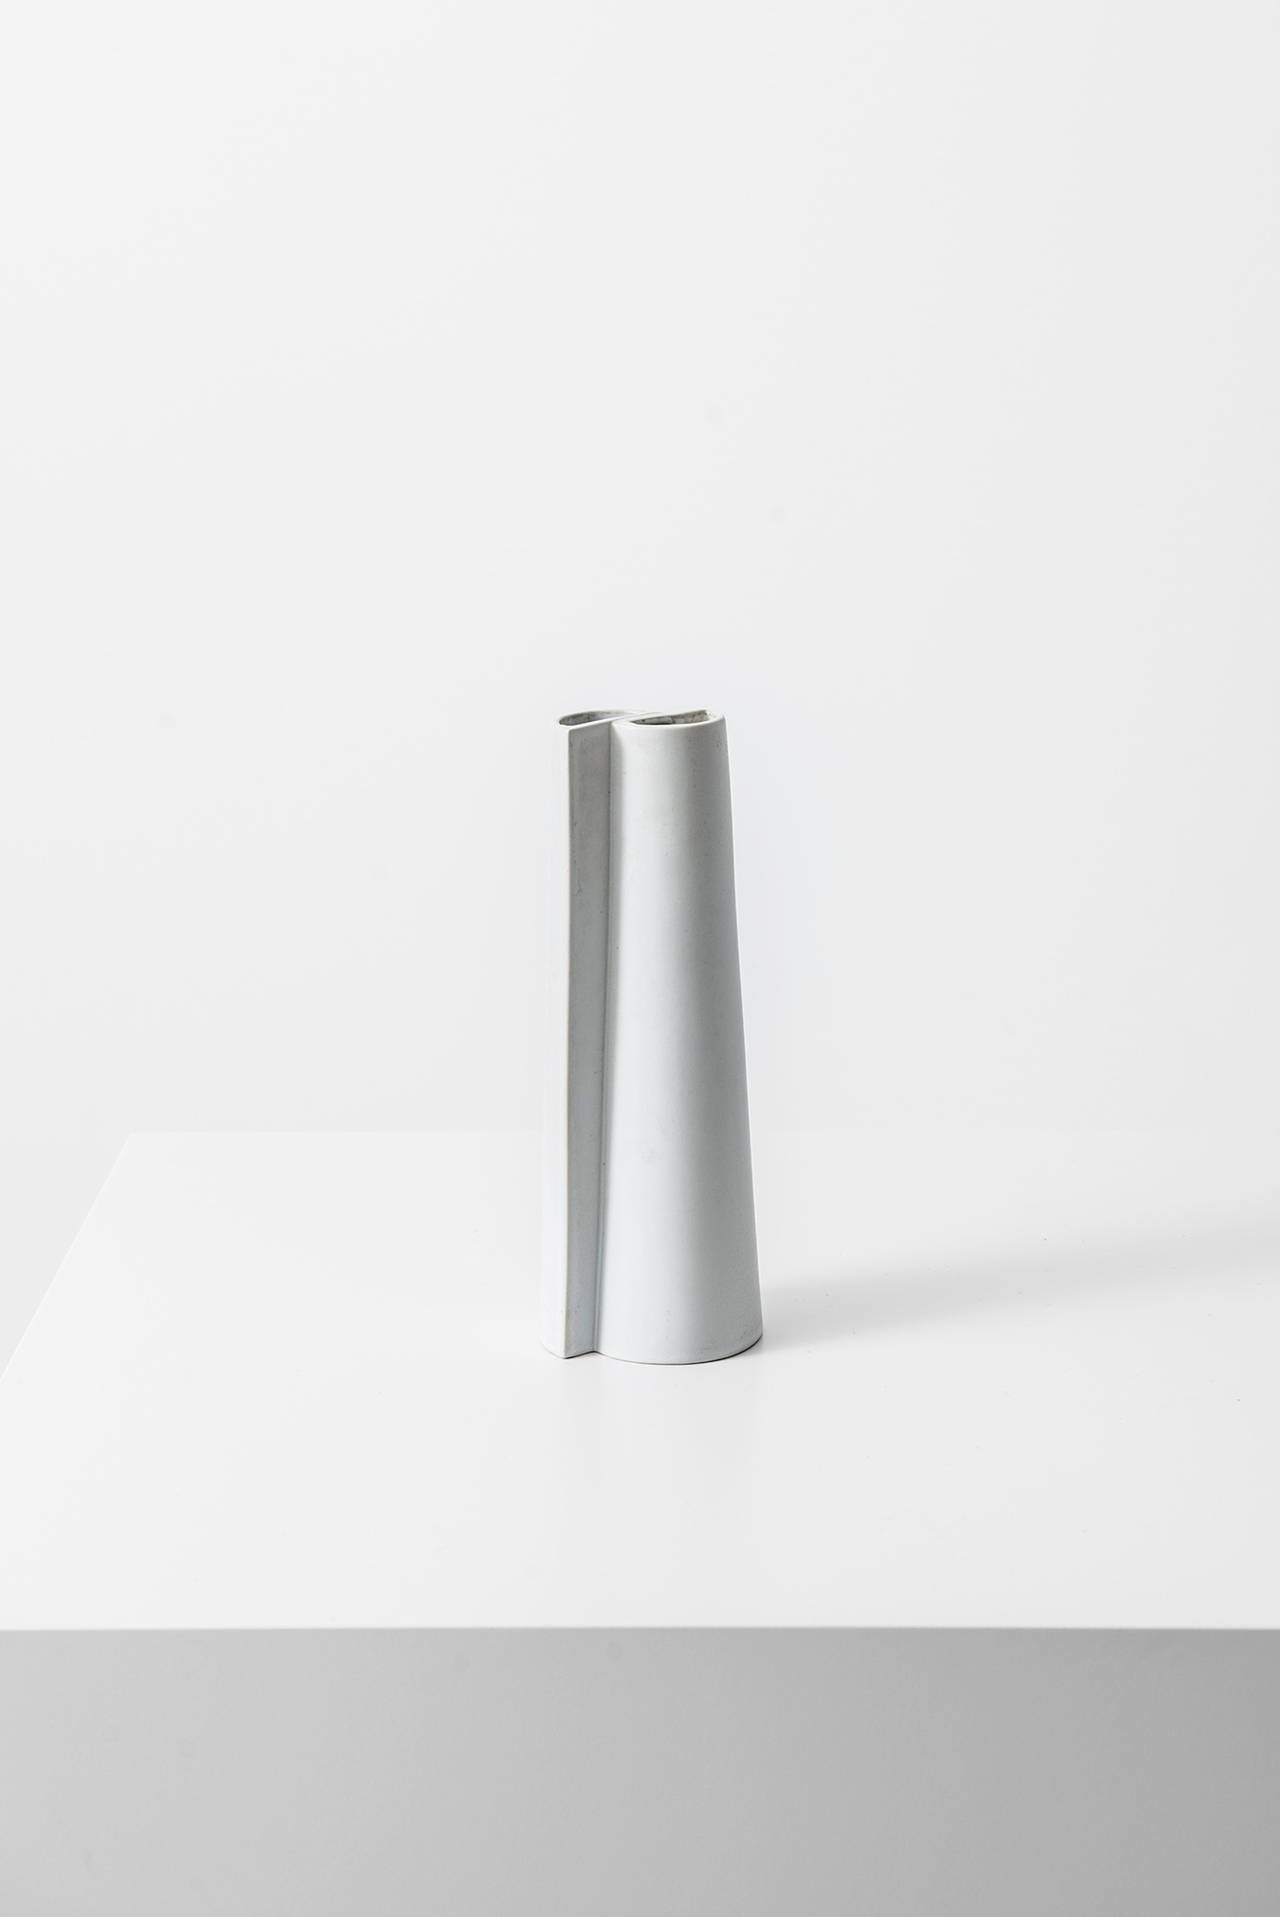 Wilhelm Kåge Ceramic Vase Model Surrea by Gustavsberg in Sweden 2